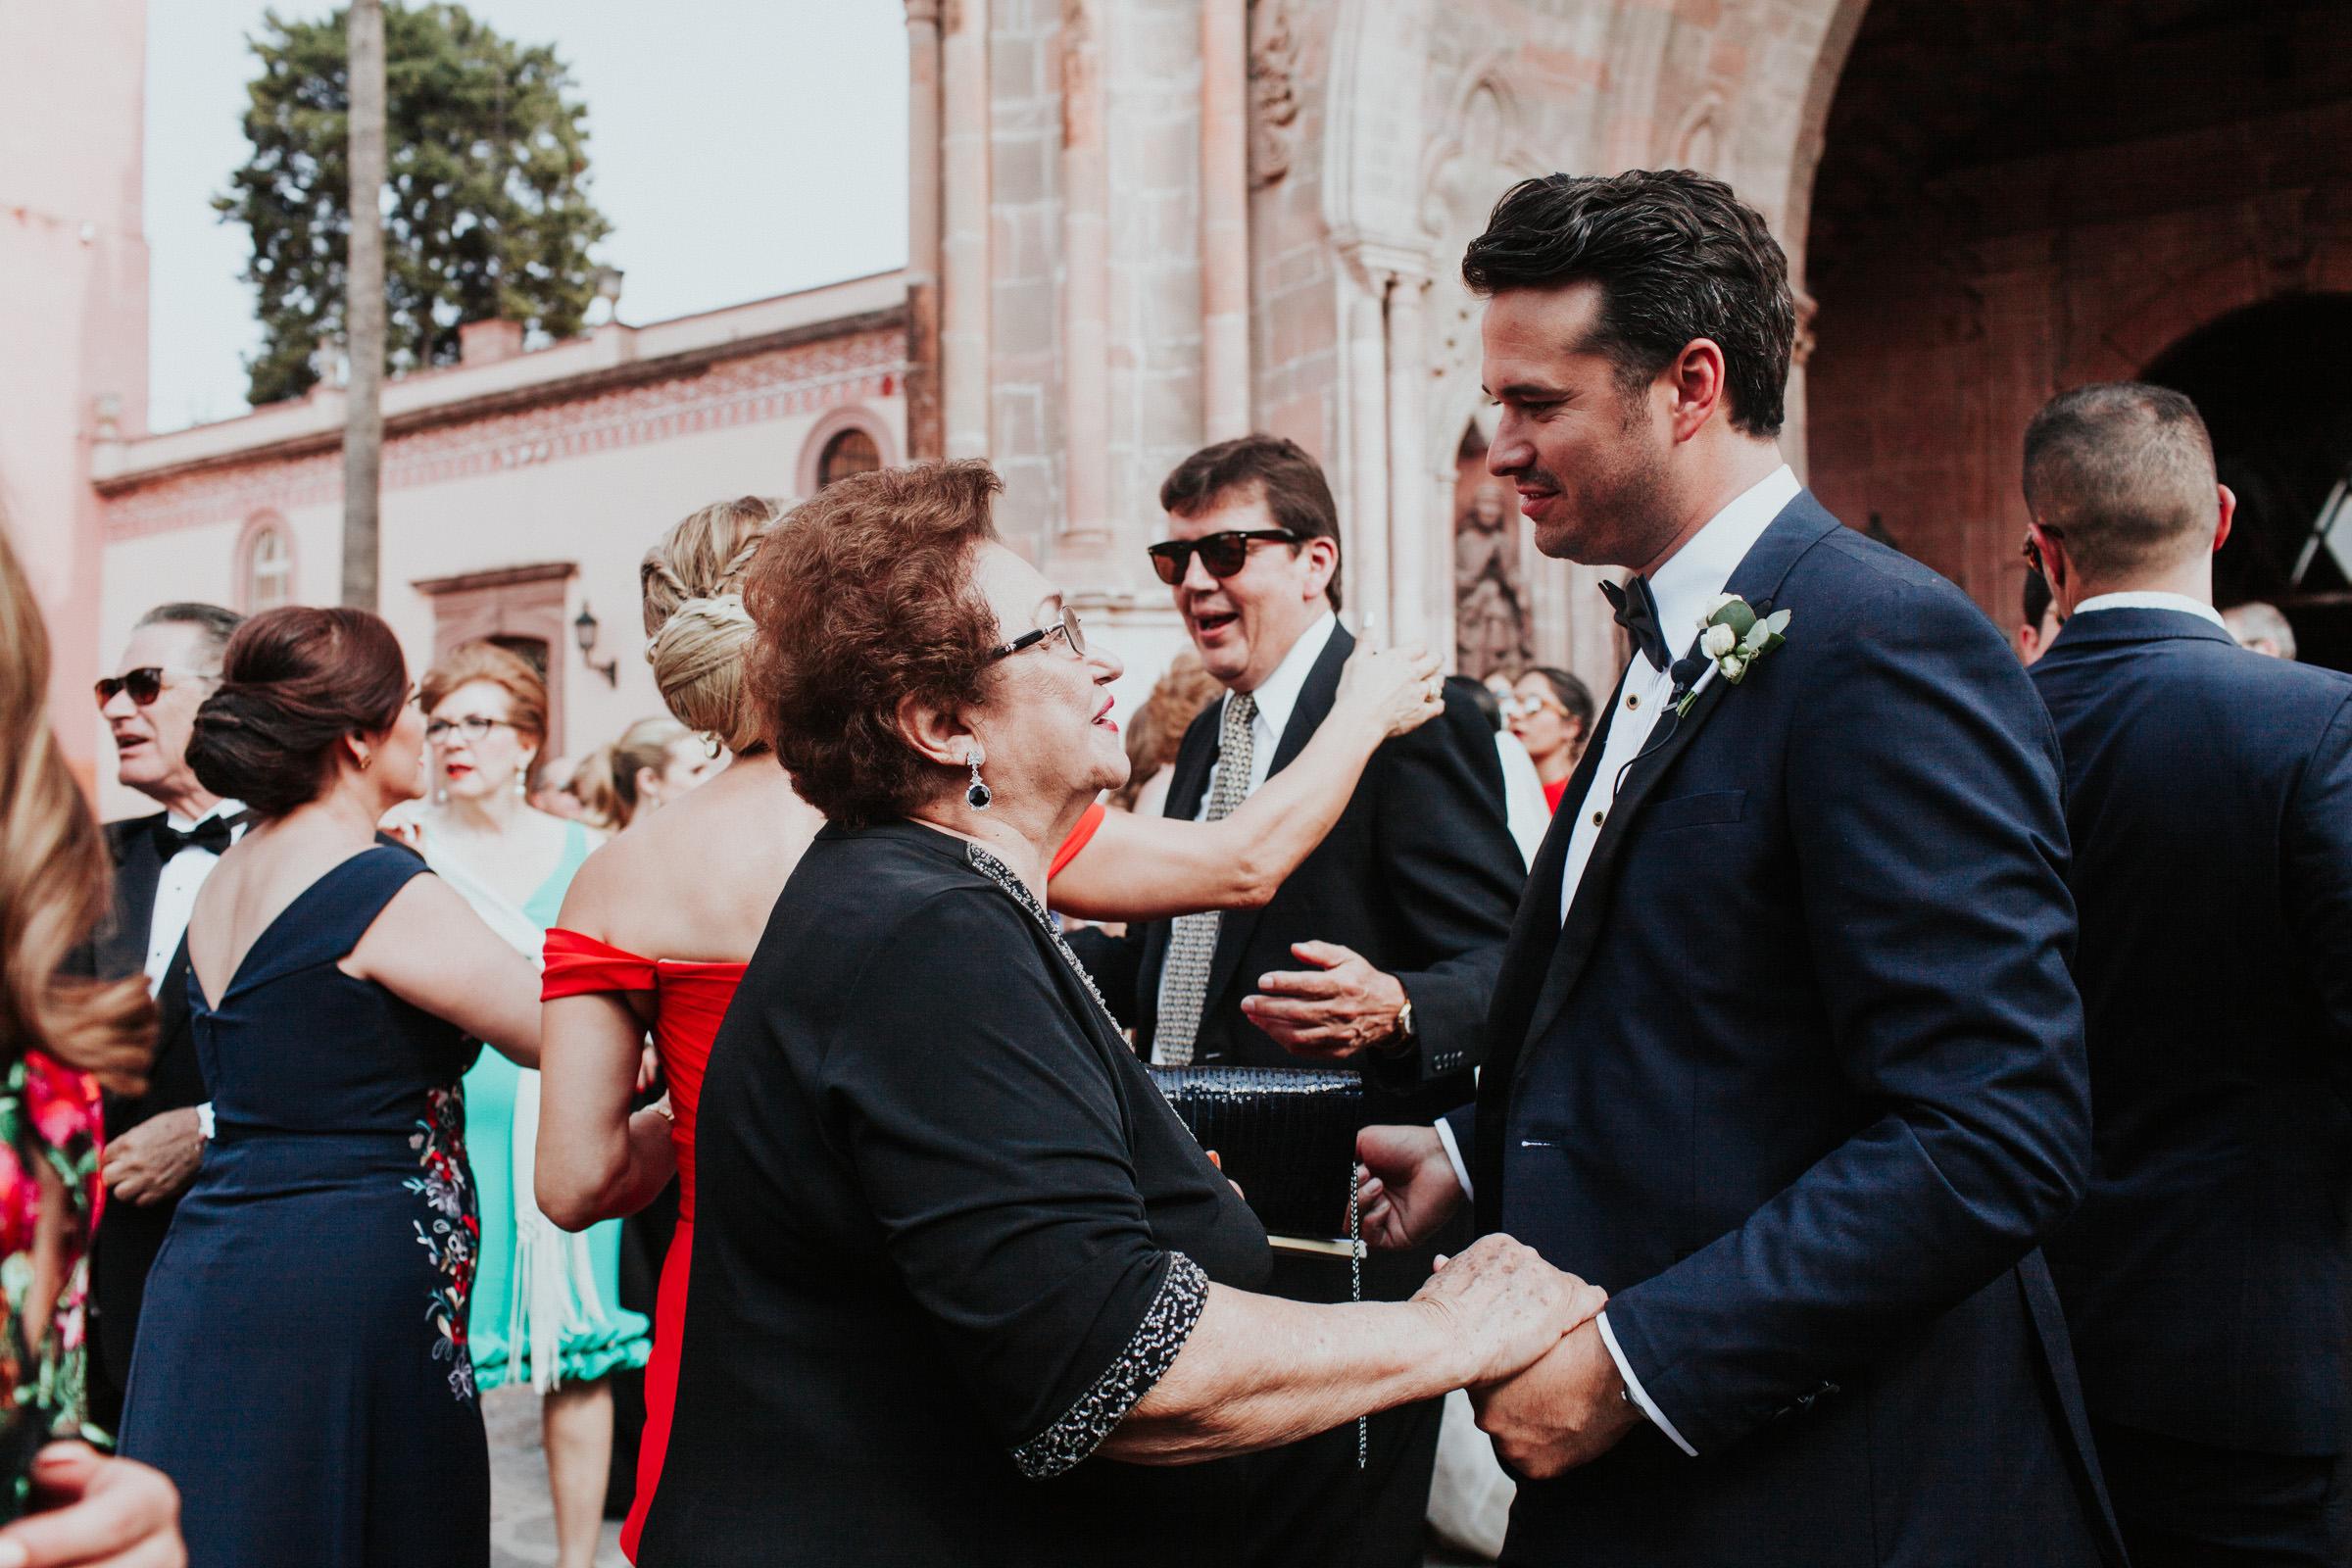 San-Miguel-de-Allende-Wedding-Photography-Parroquia-Instituto-Boda-Fotografia-Fer-Sergio-Pierce-Lifestyle-Photography0297.JPG